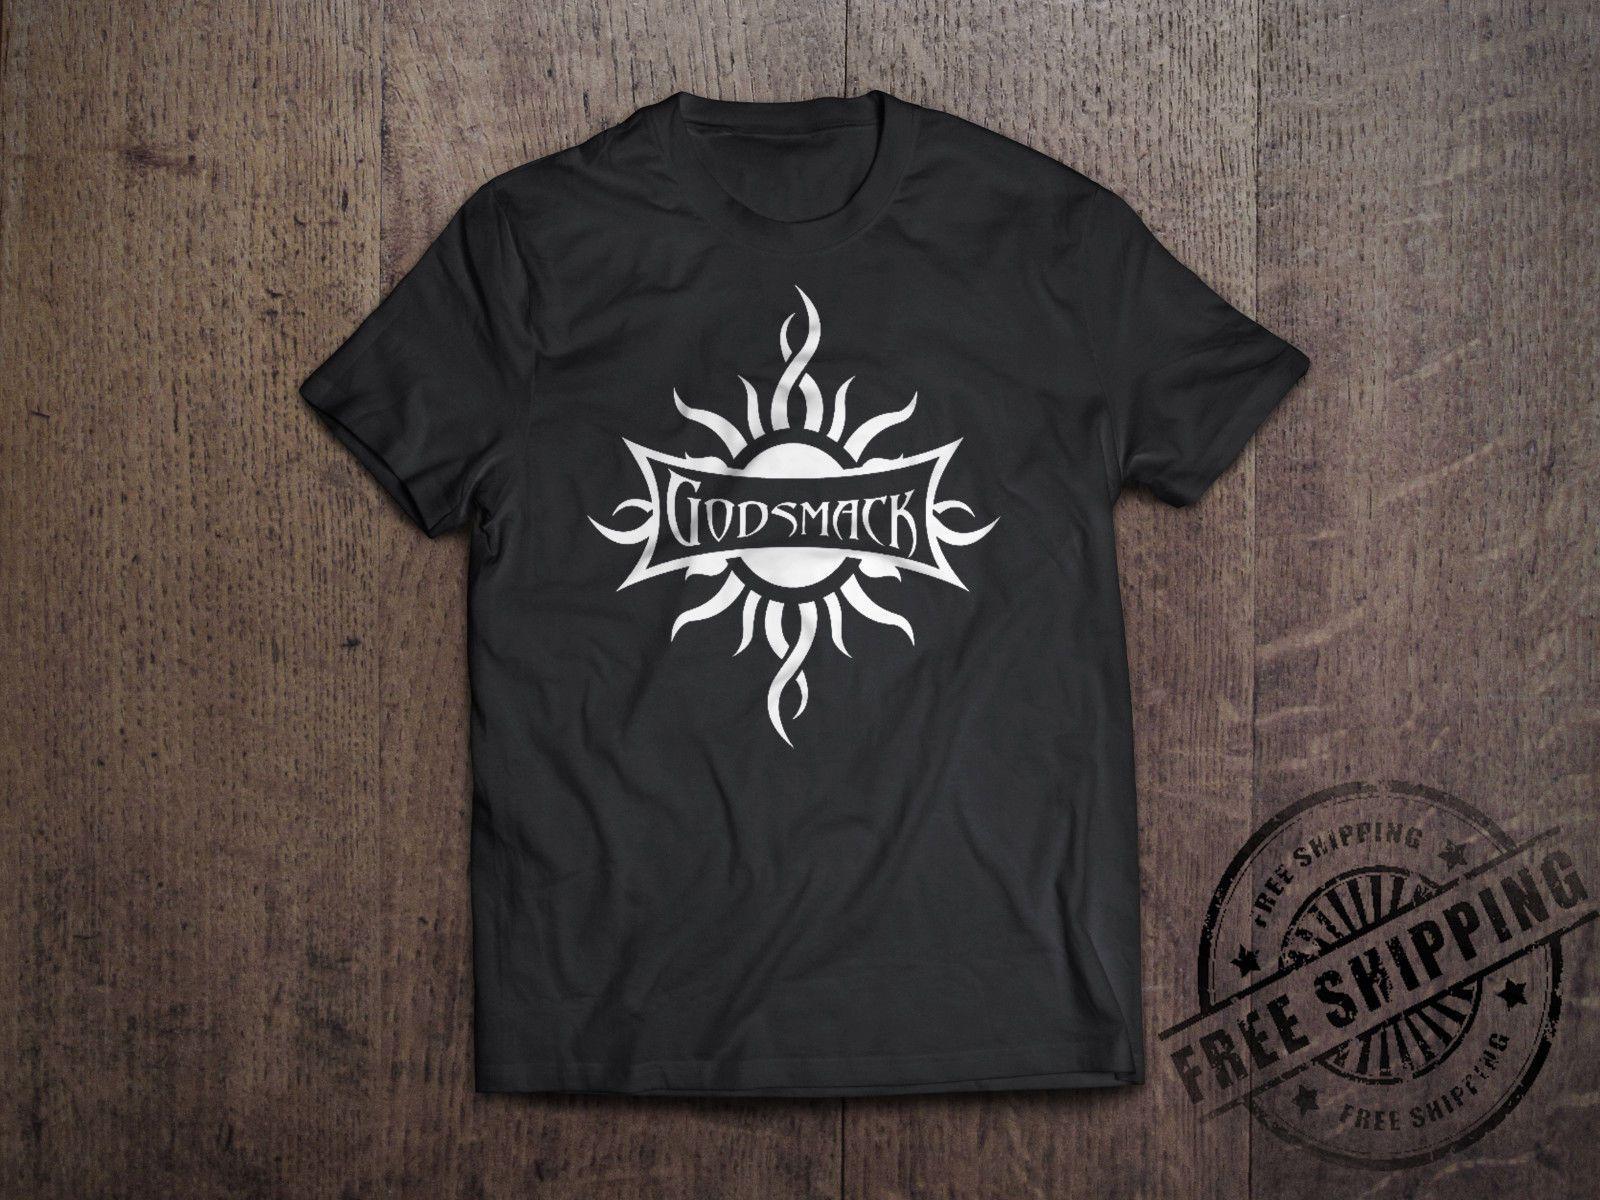 Godsmack Metal Rock Band Logo T-Shirt Men Women Unisex Grey Tee Size S-3XL